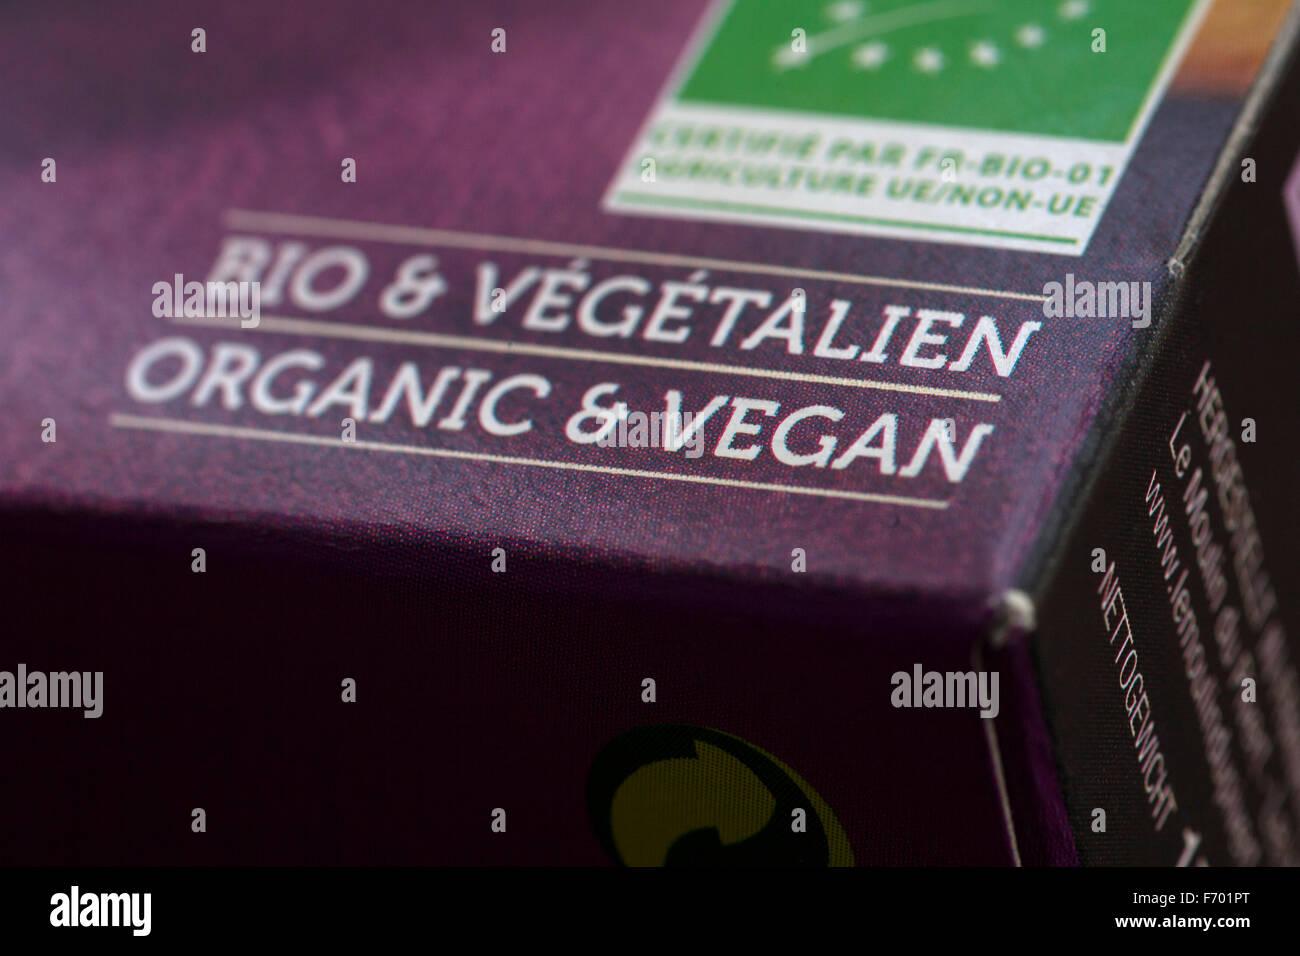 French vegan product - Stock Image